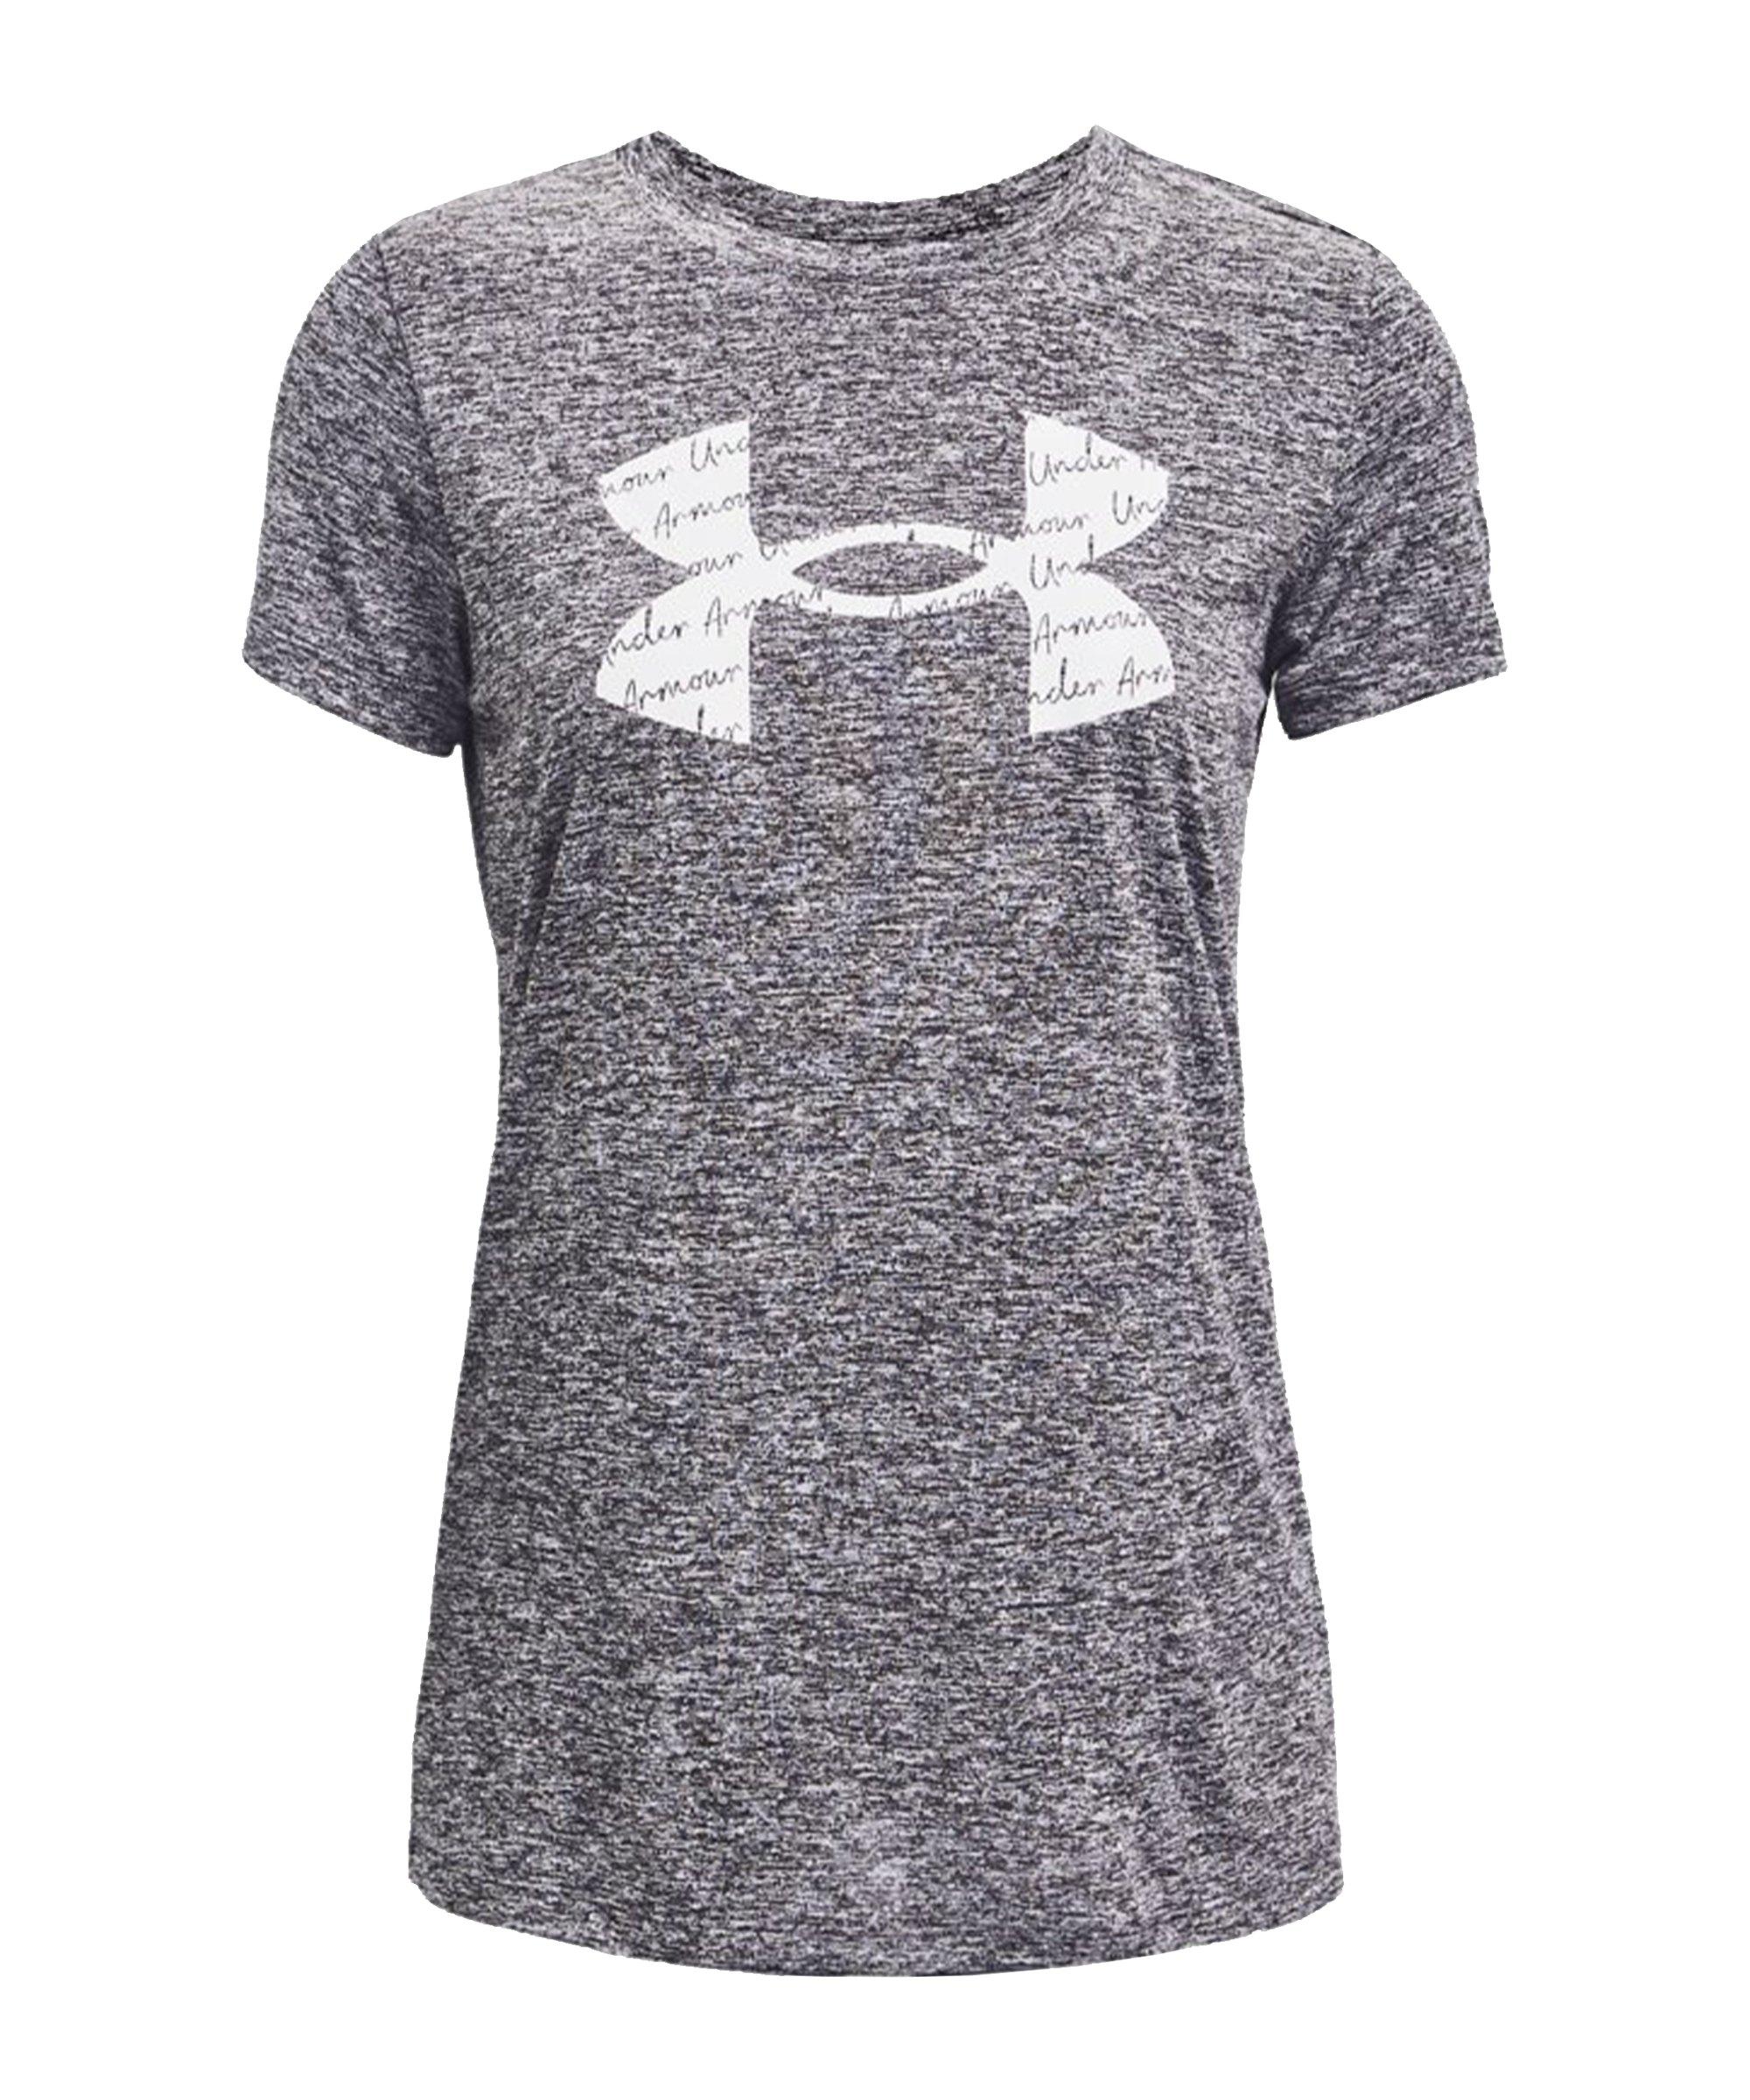 Under Armour Tech Twist T-Shirt Damen Grau F011 - grau